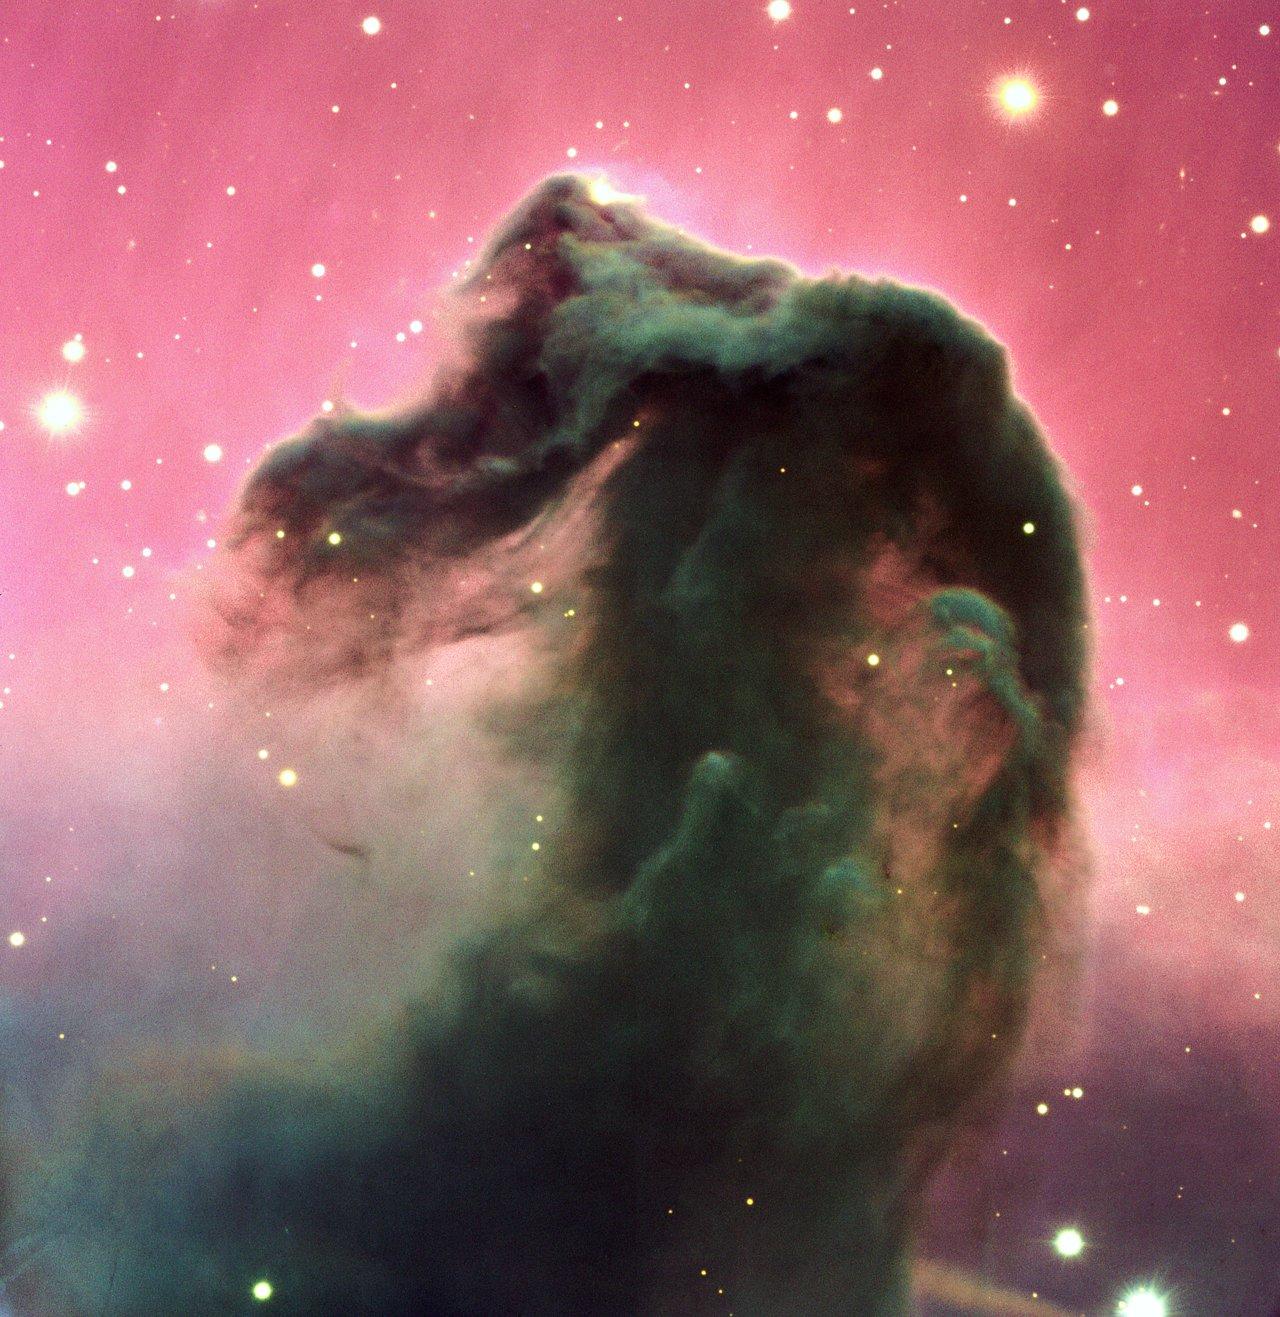 Mounted image 031: The Horsehead Nebula